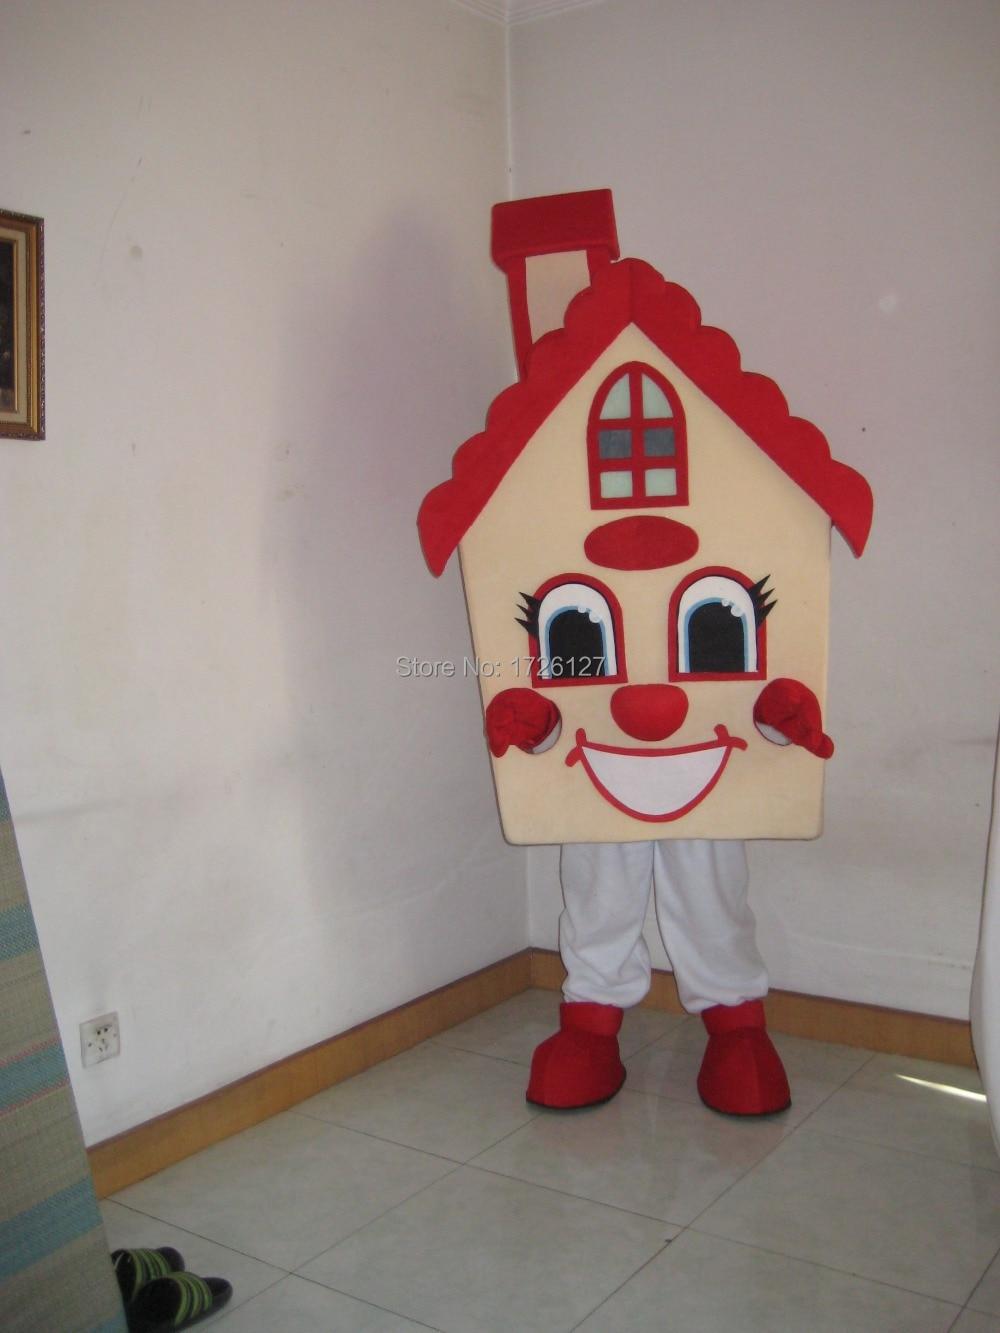 mascot-fontbmaxwell-b-font-fontbhouse-b-font-mascot-costume-custom-anime-cosplay-kits-mascotte-theme